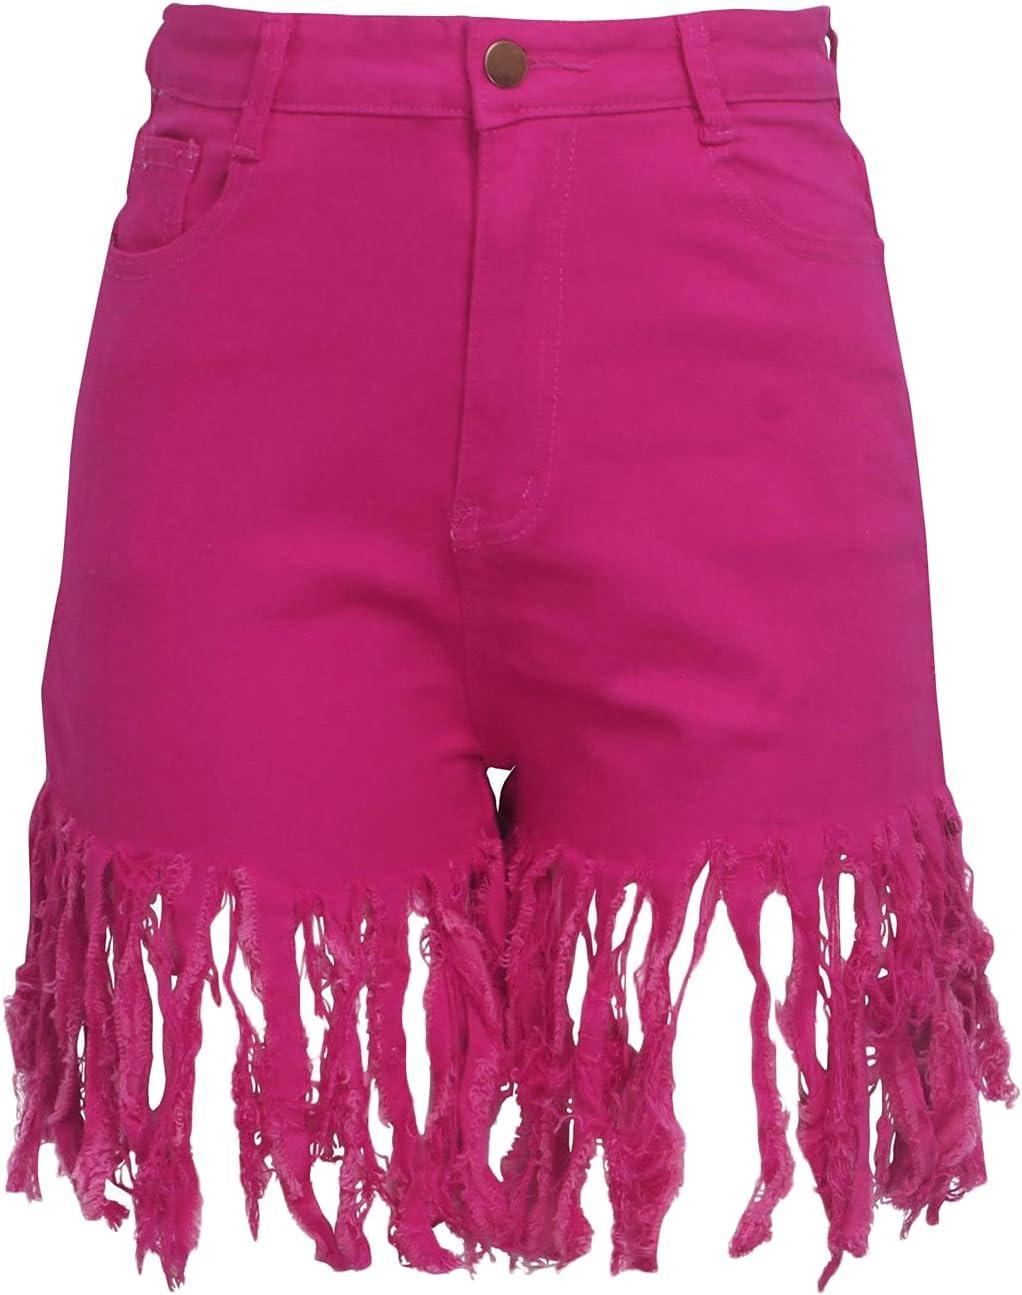 High Waist Chicago Mall Tassels Max 57% OFF Jean Shorts for Raw Summer Stretchy Women Hem